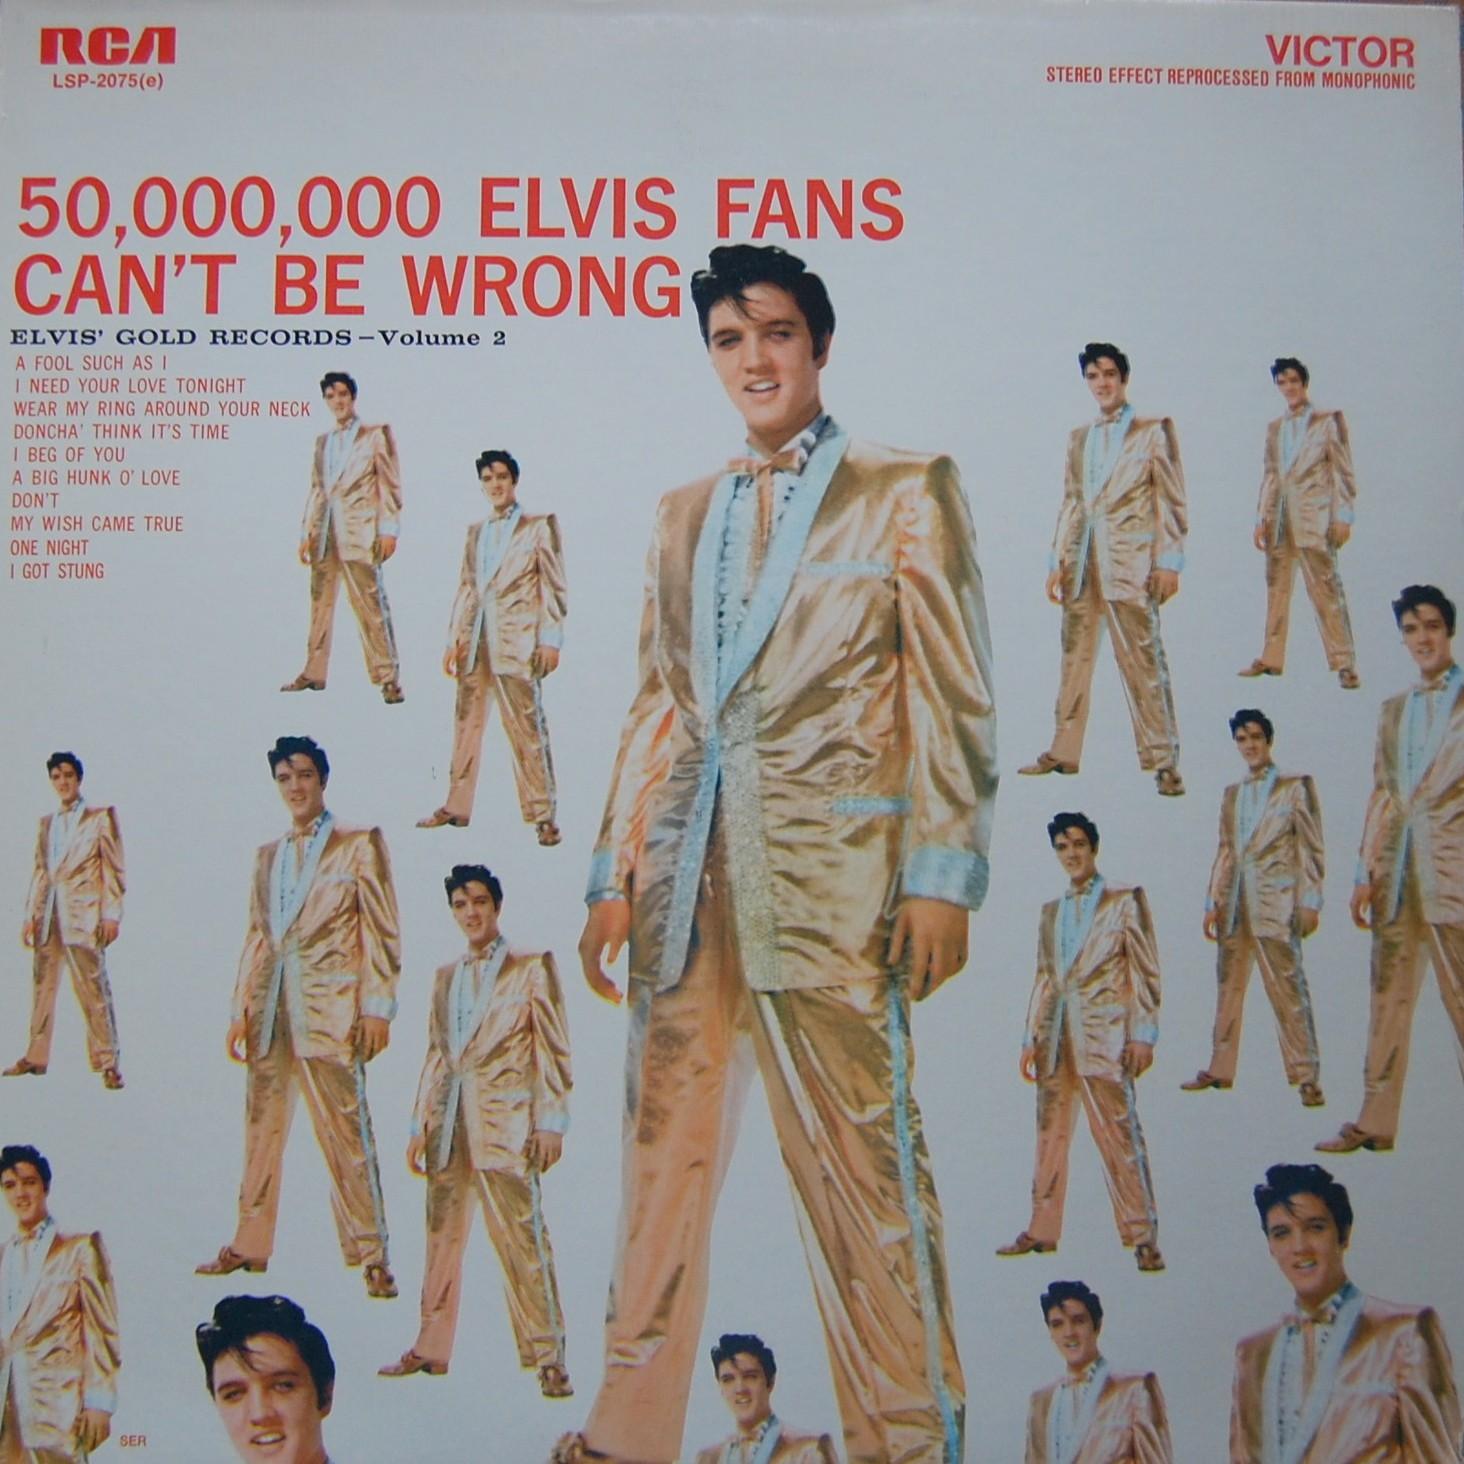 ELVIS' GOLD RECORDS VOL 2 Lsp2075au8qbq